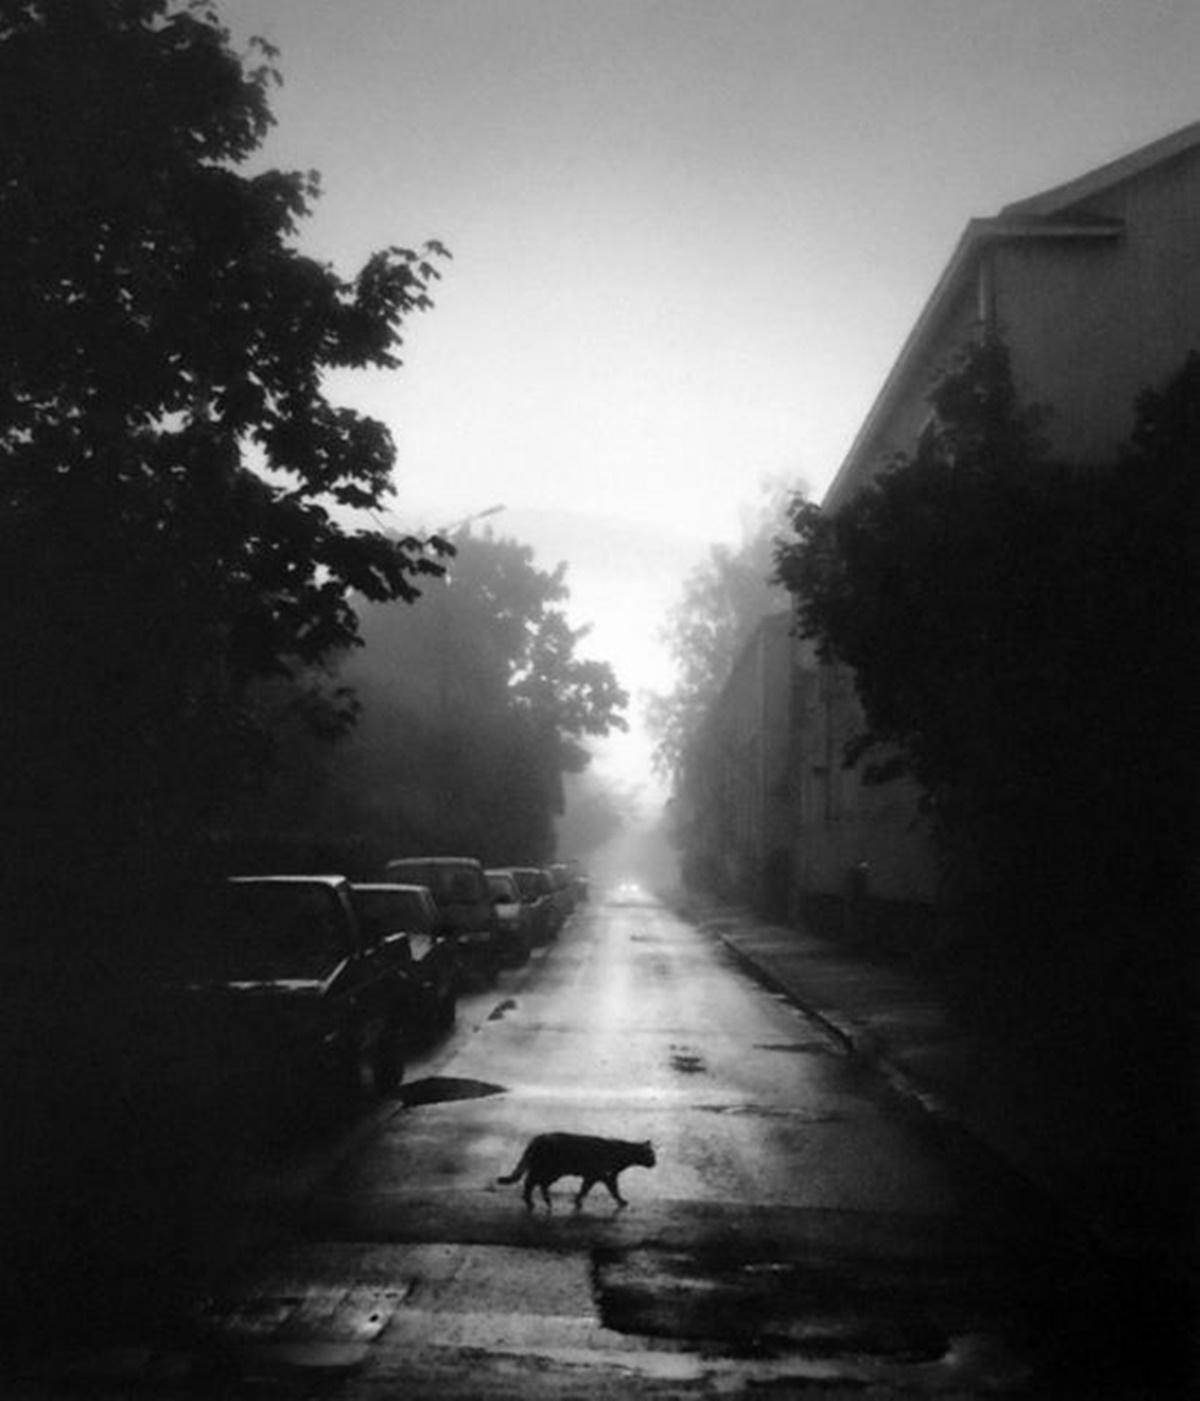 Pentti Sammallahti Helsinki, Finland, Cat Crossing the Street, 2000.jpg